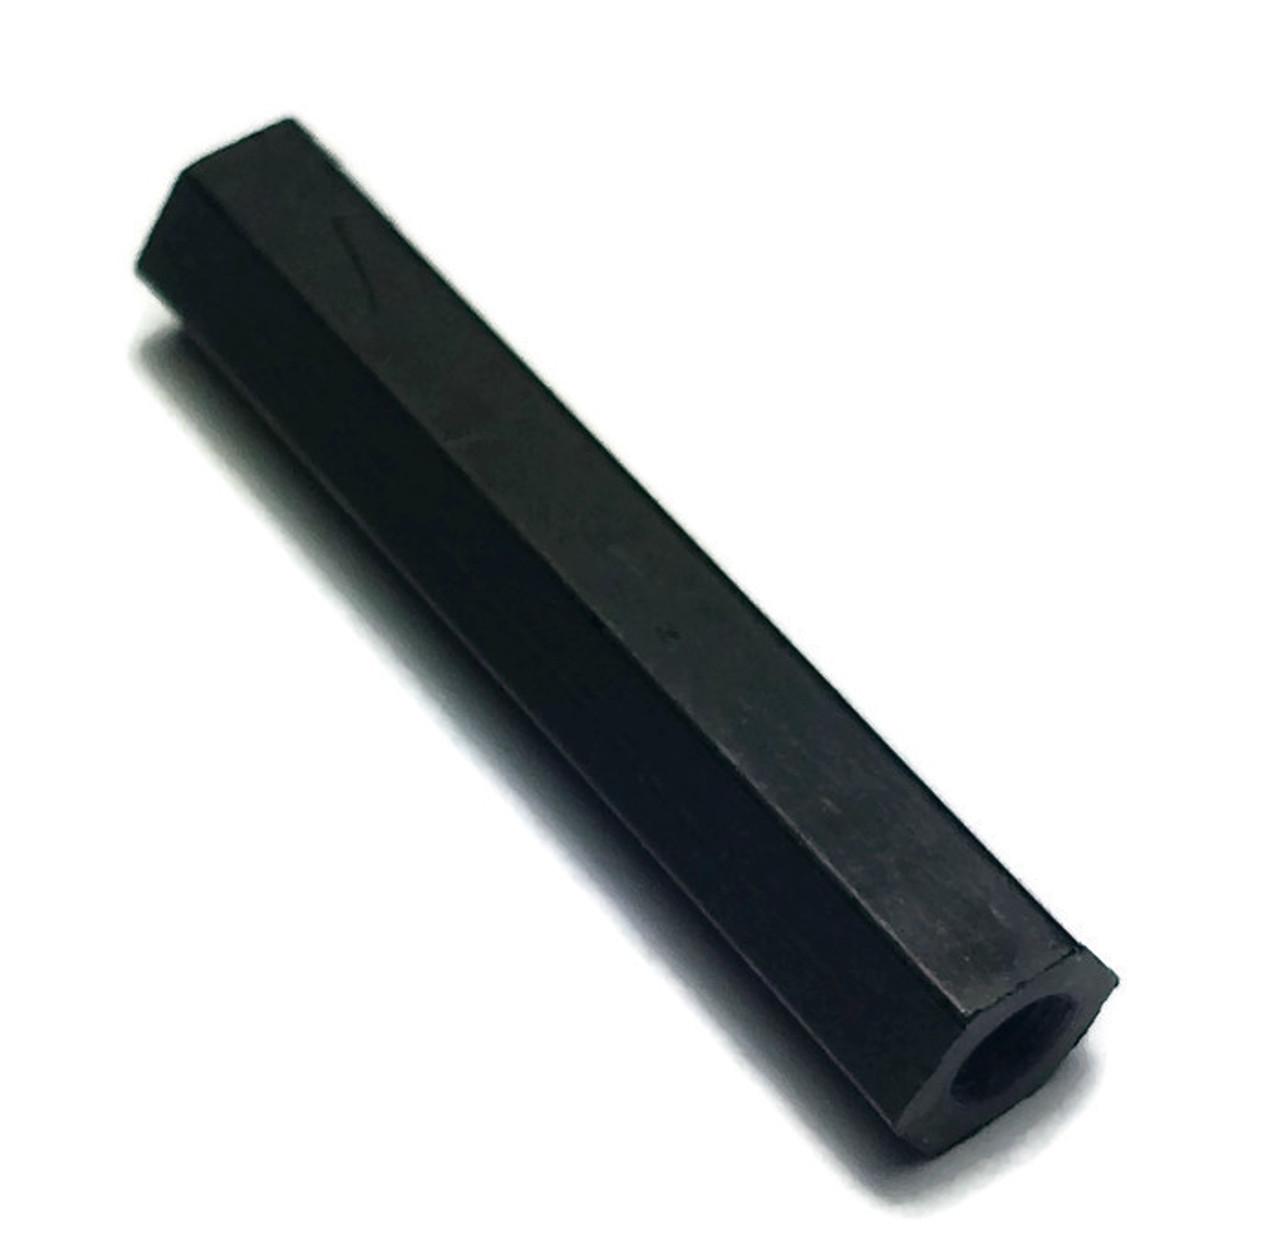 30mm M3 Nylon Standoff (10 pieces)